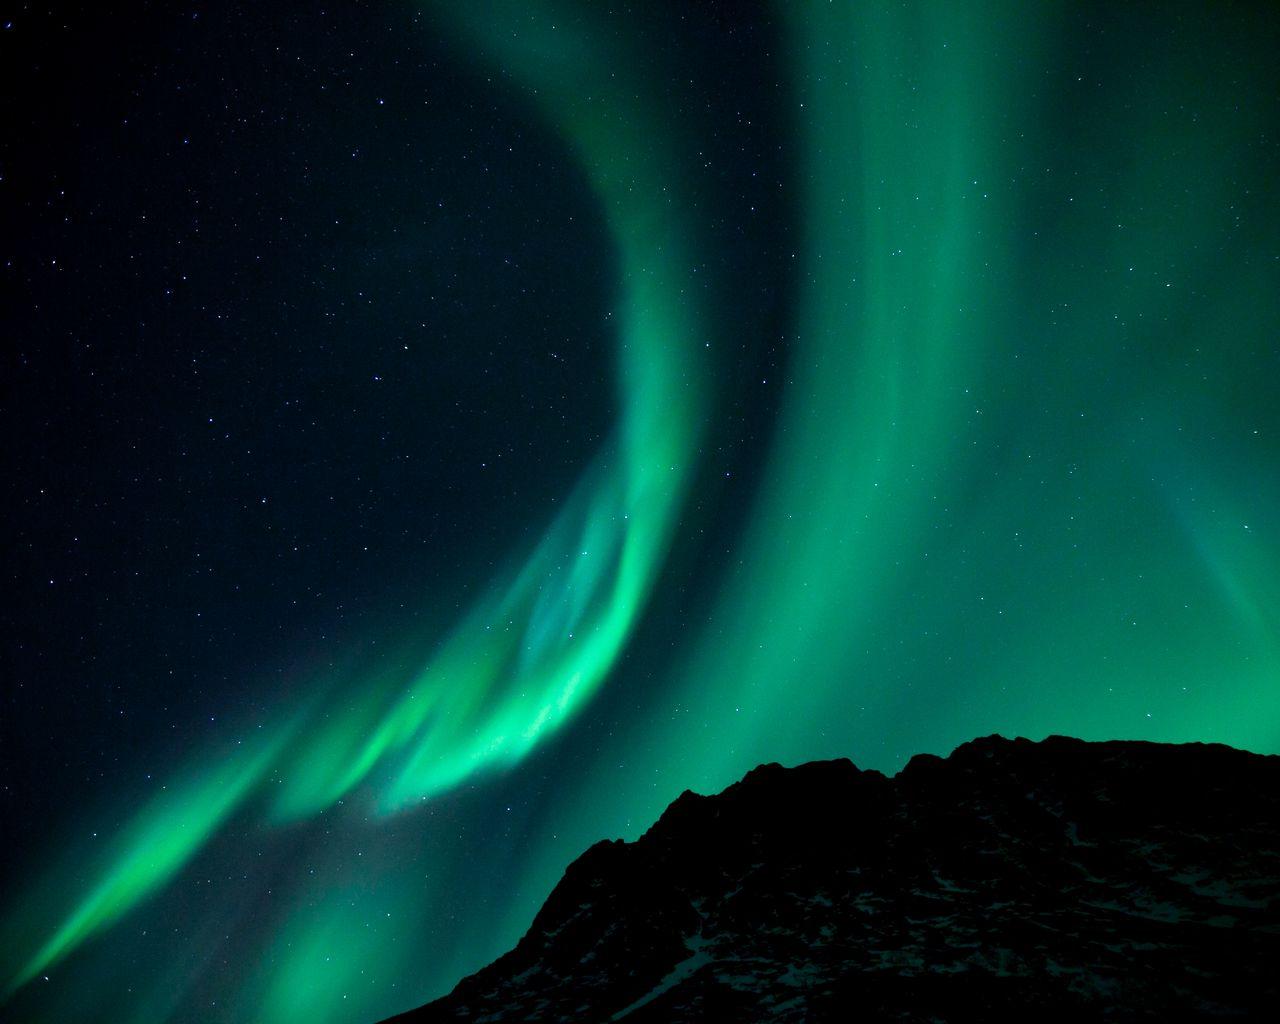 1280x1024 Wallpaper northern lights, night, night sky, phenomenon